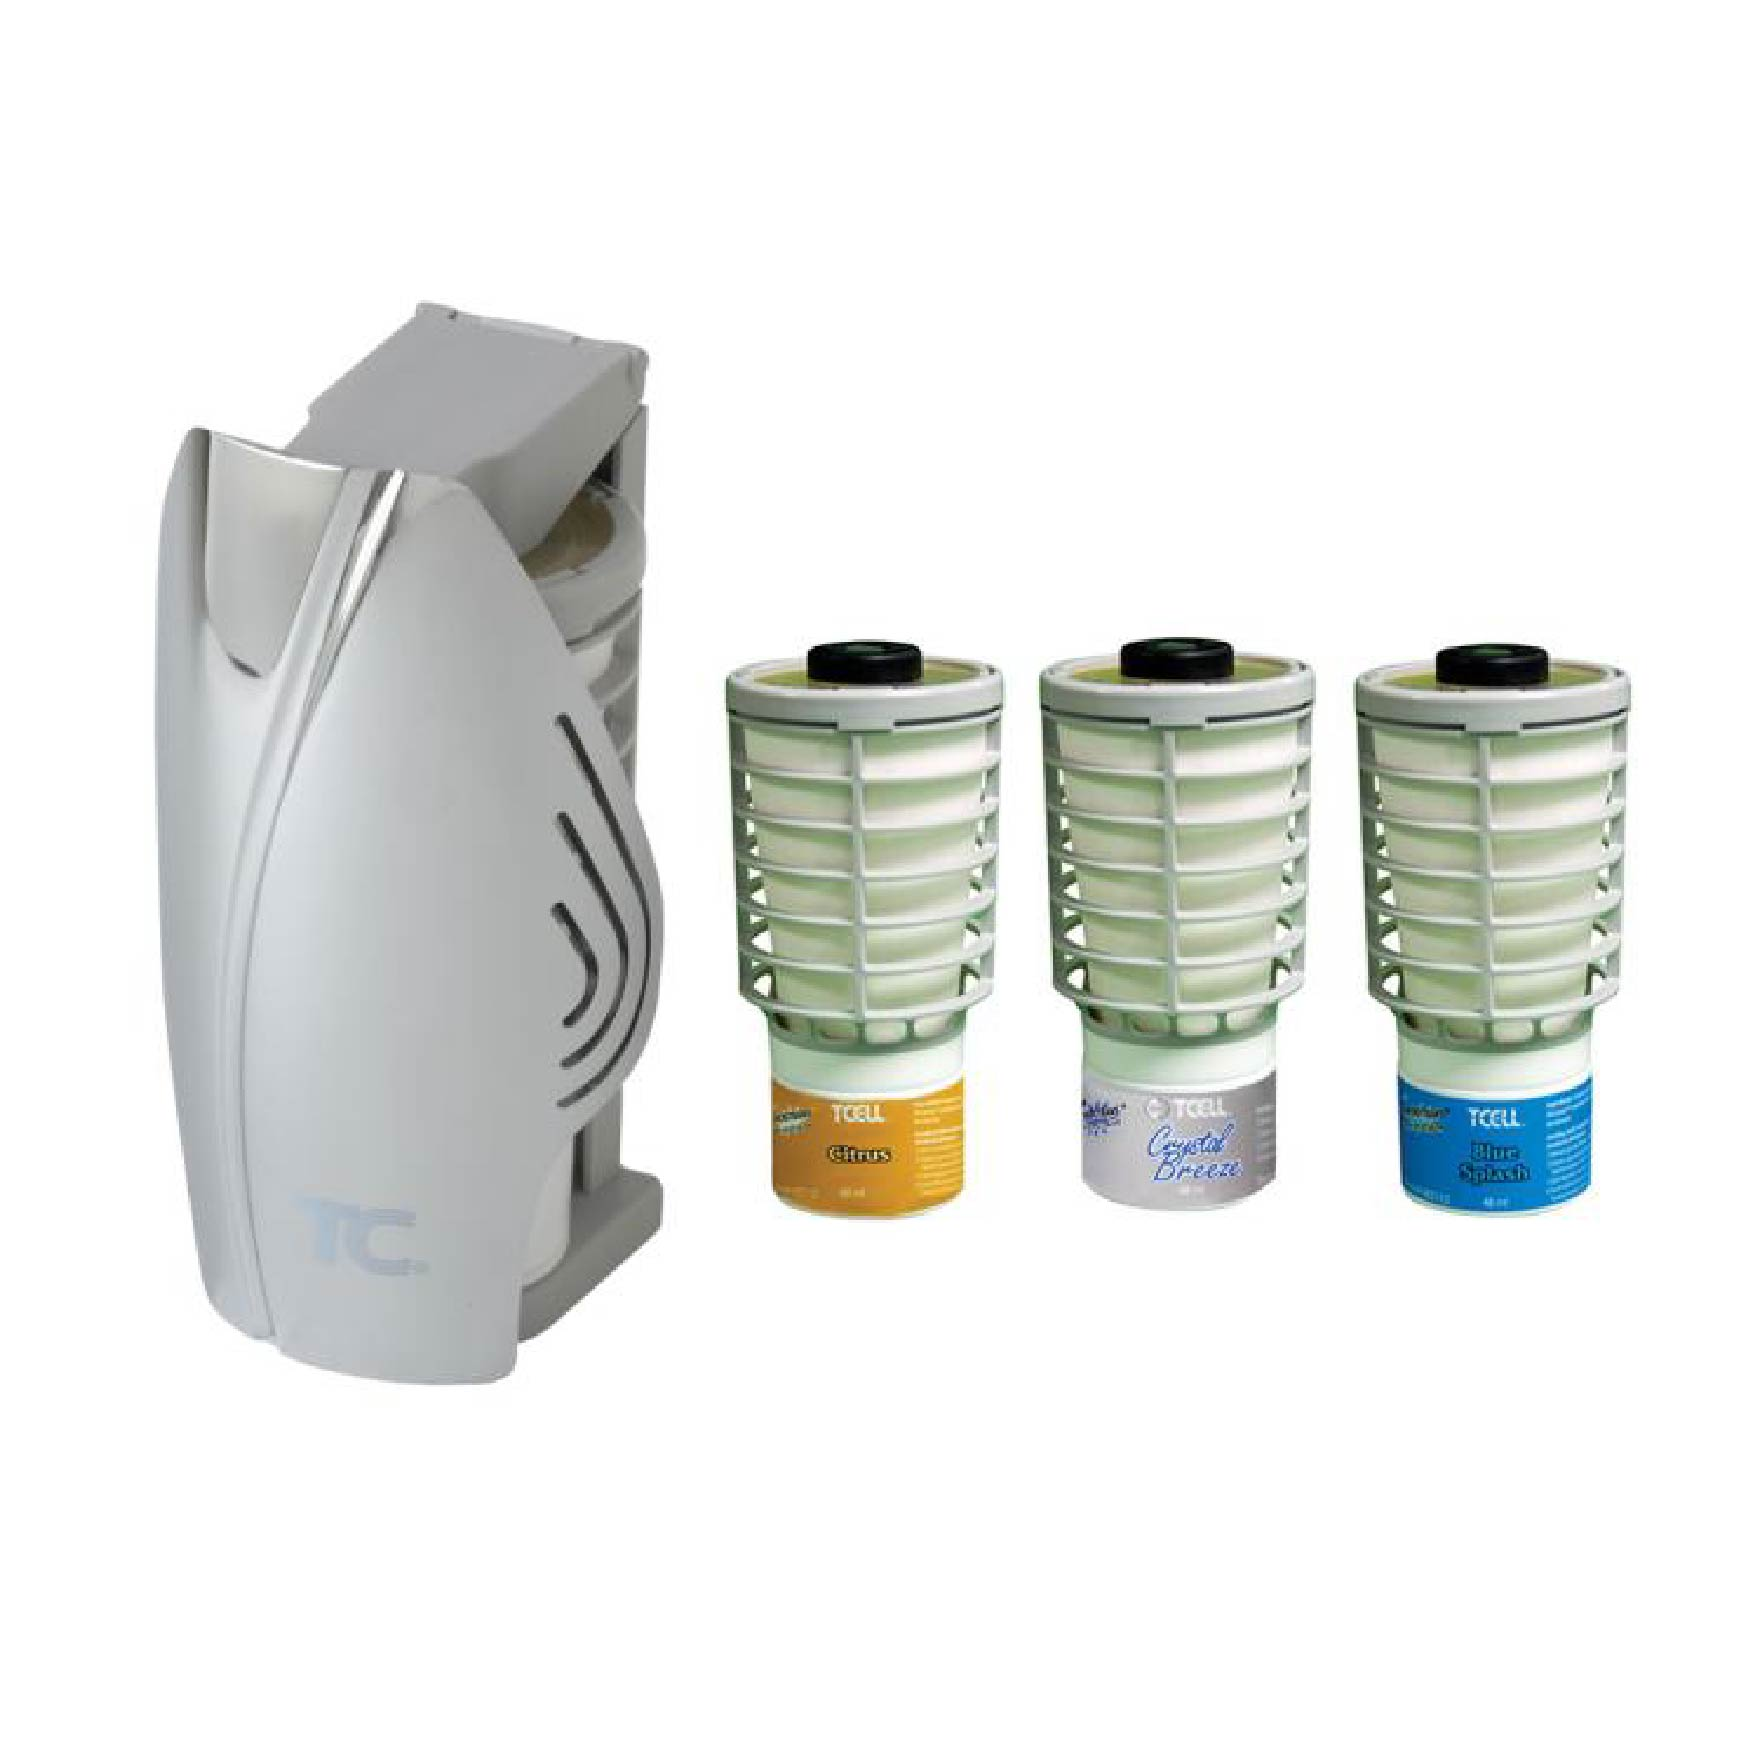 T-Cell™ Air Freshener/ Deodorizer